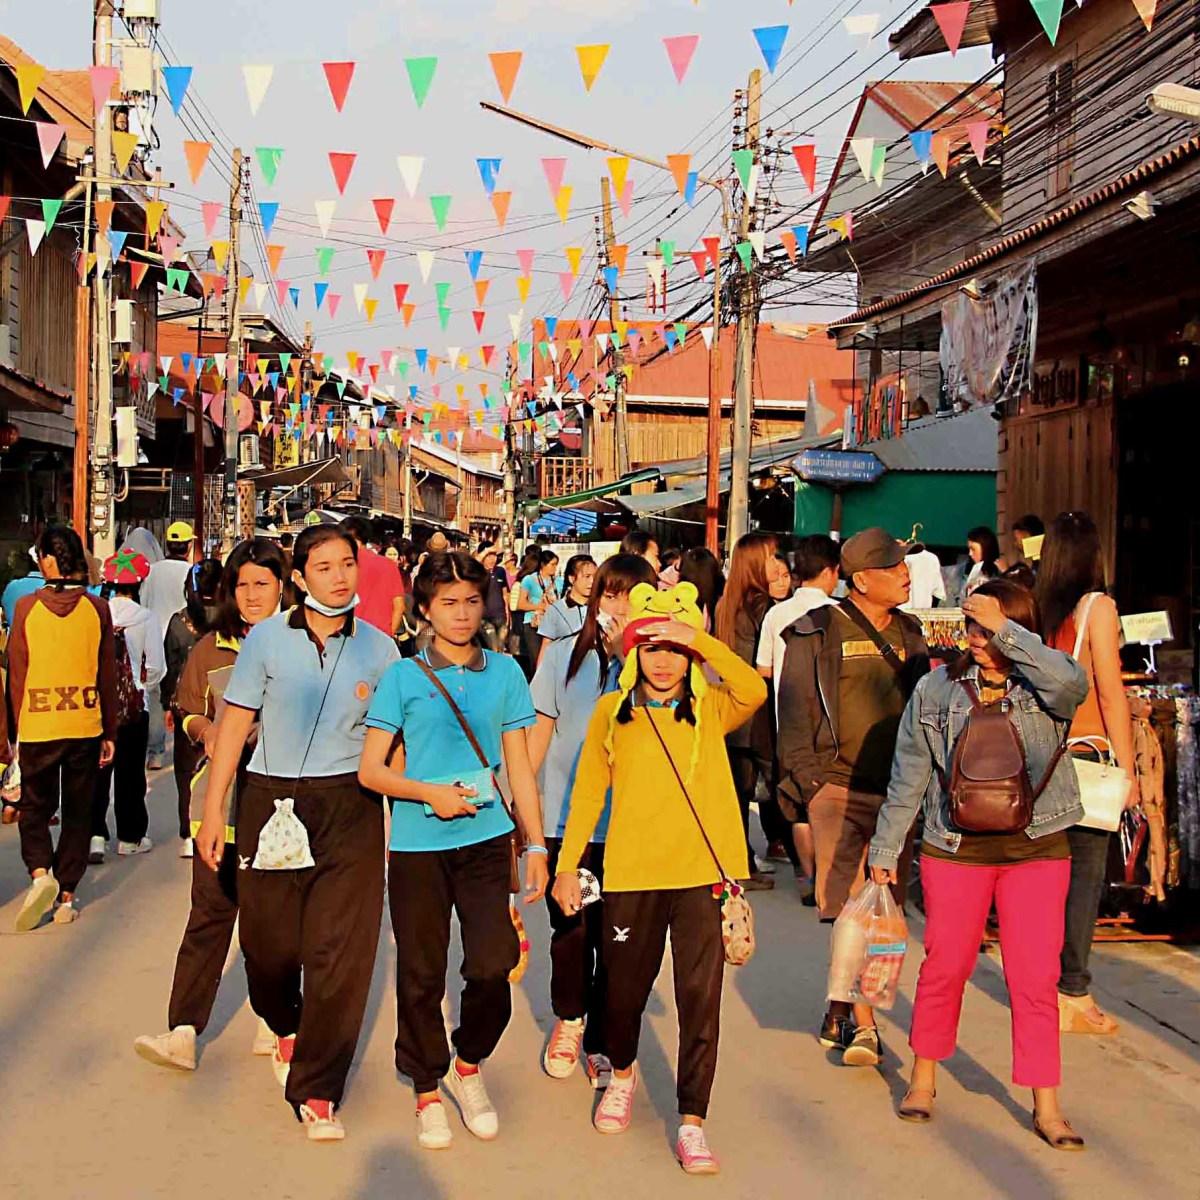 Thailand: The Chiang Khan Walking Street